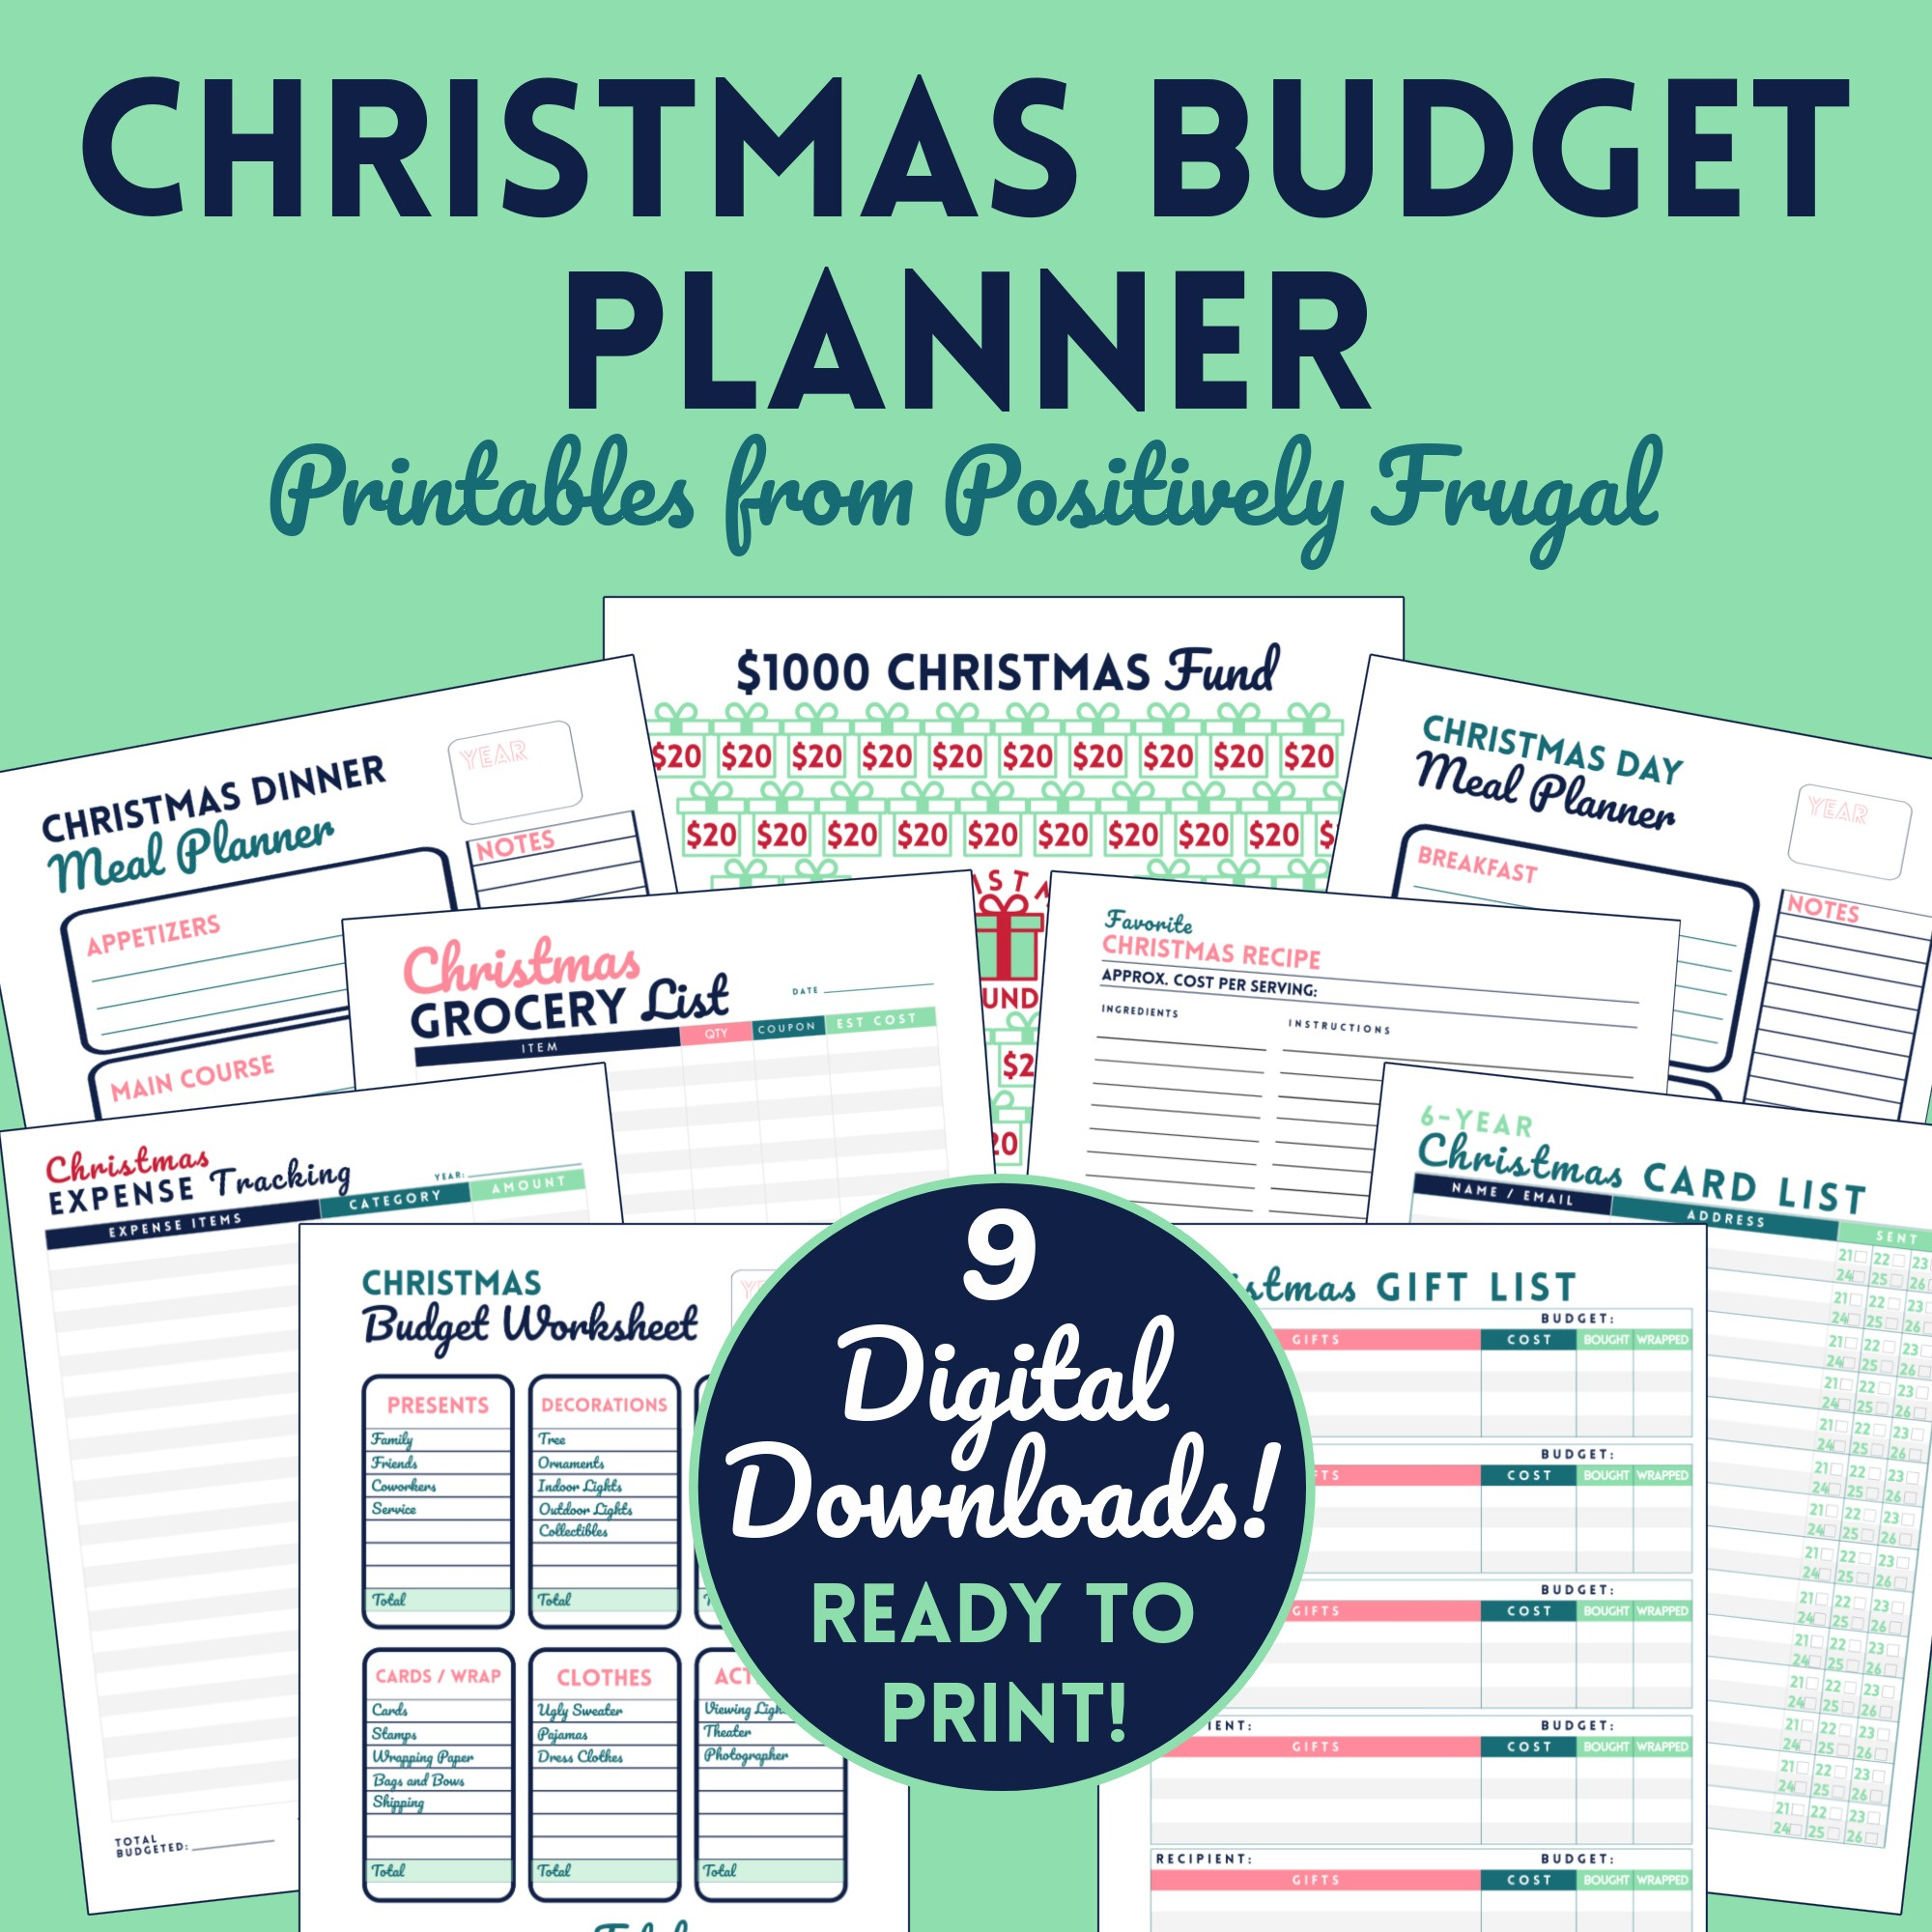 Christmas Budget Planner Bundle Etsy by PositivelyFrugal.com